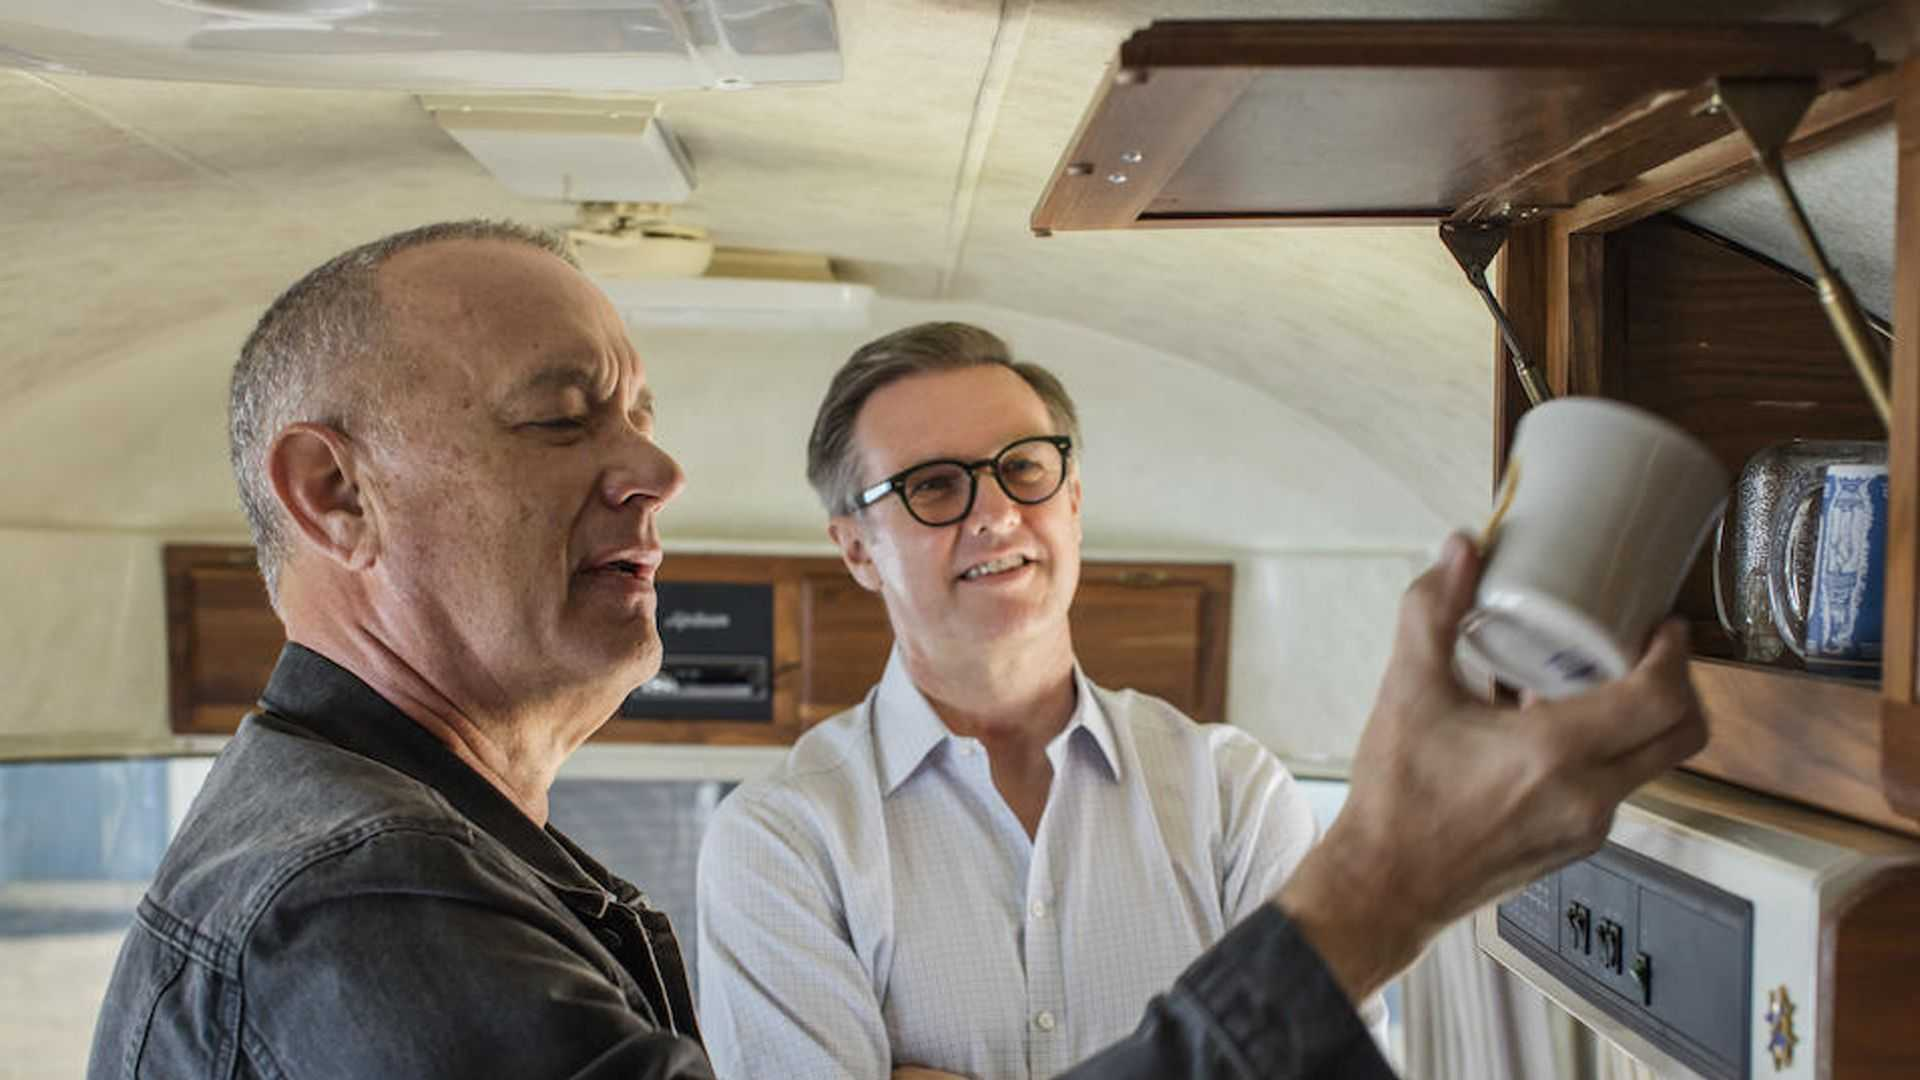 Tom-Hanks-Airstream-trailer-for-sale-5